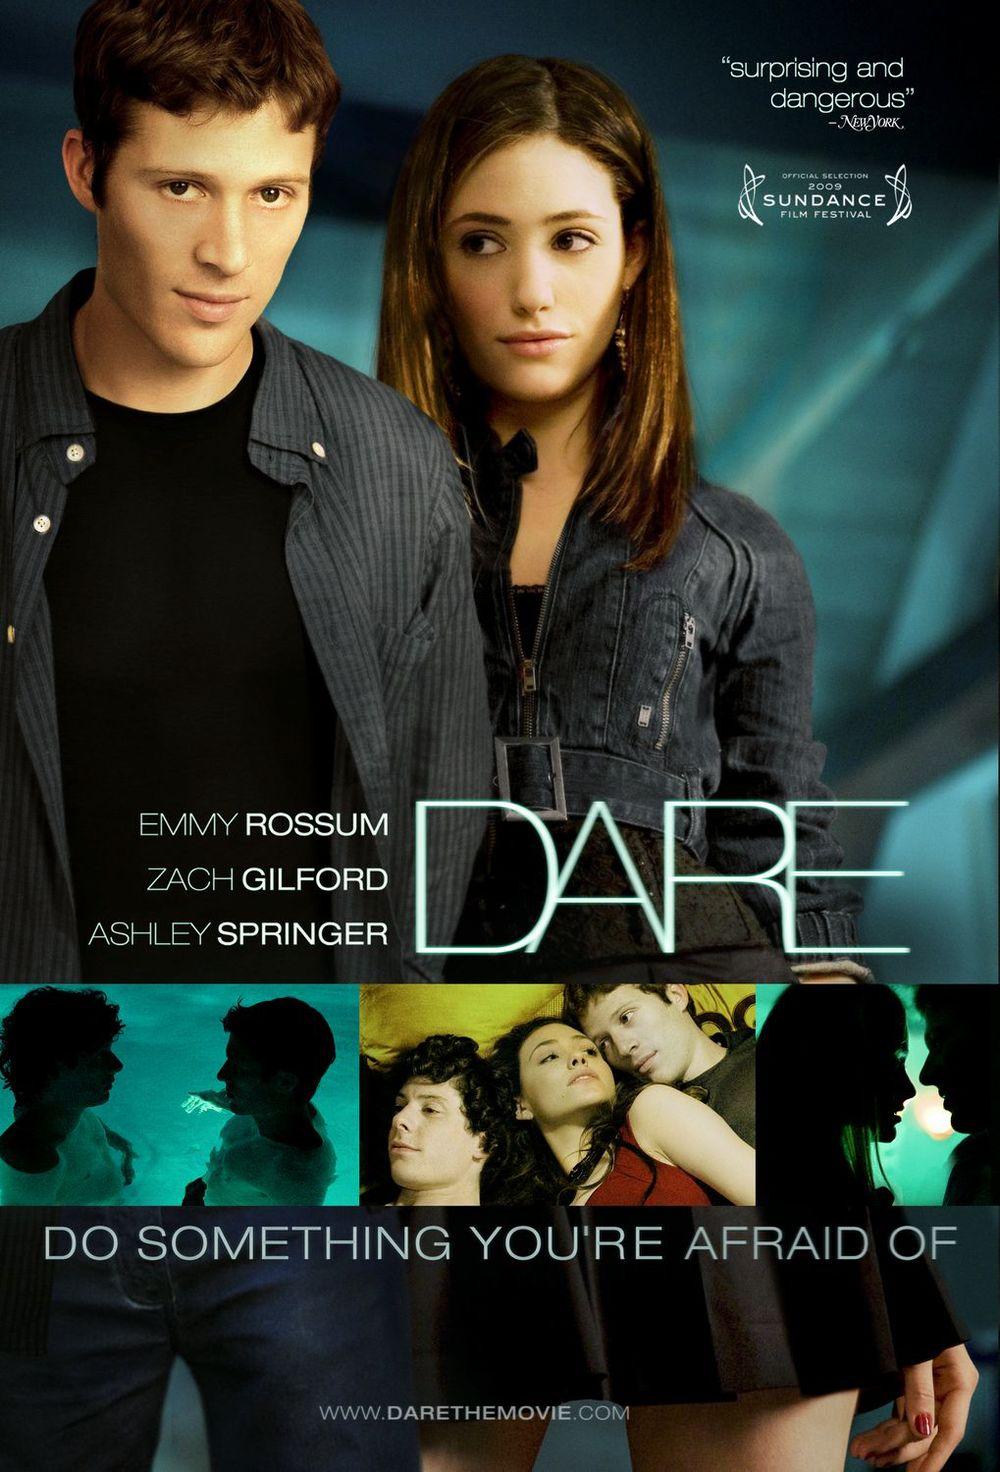 dare_xlg.jpg